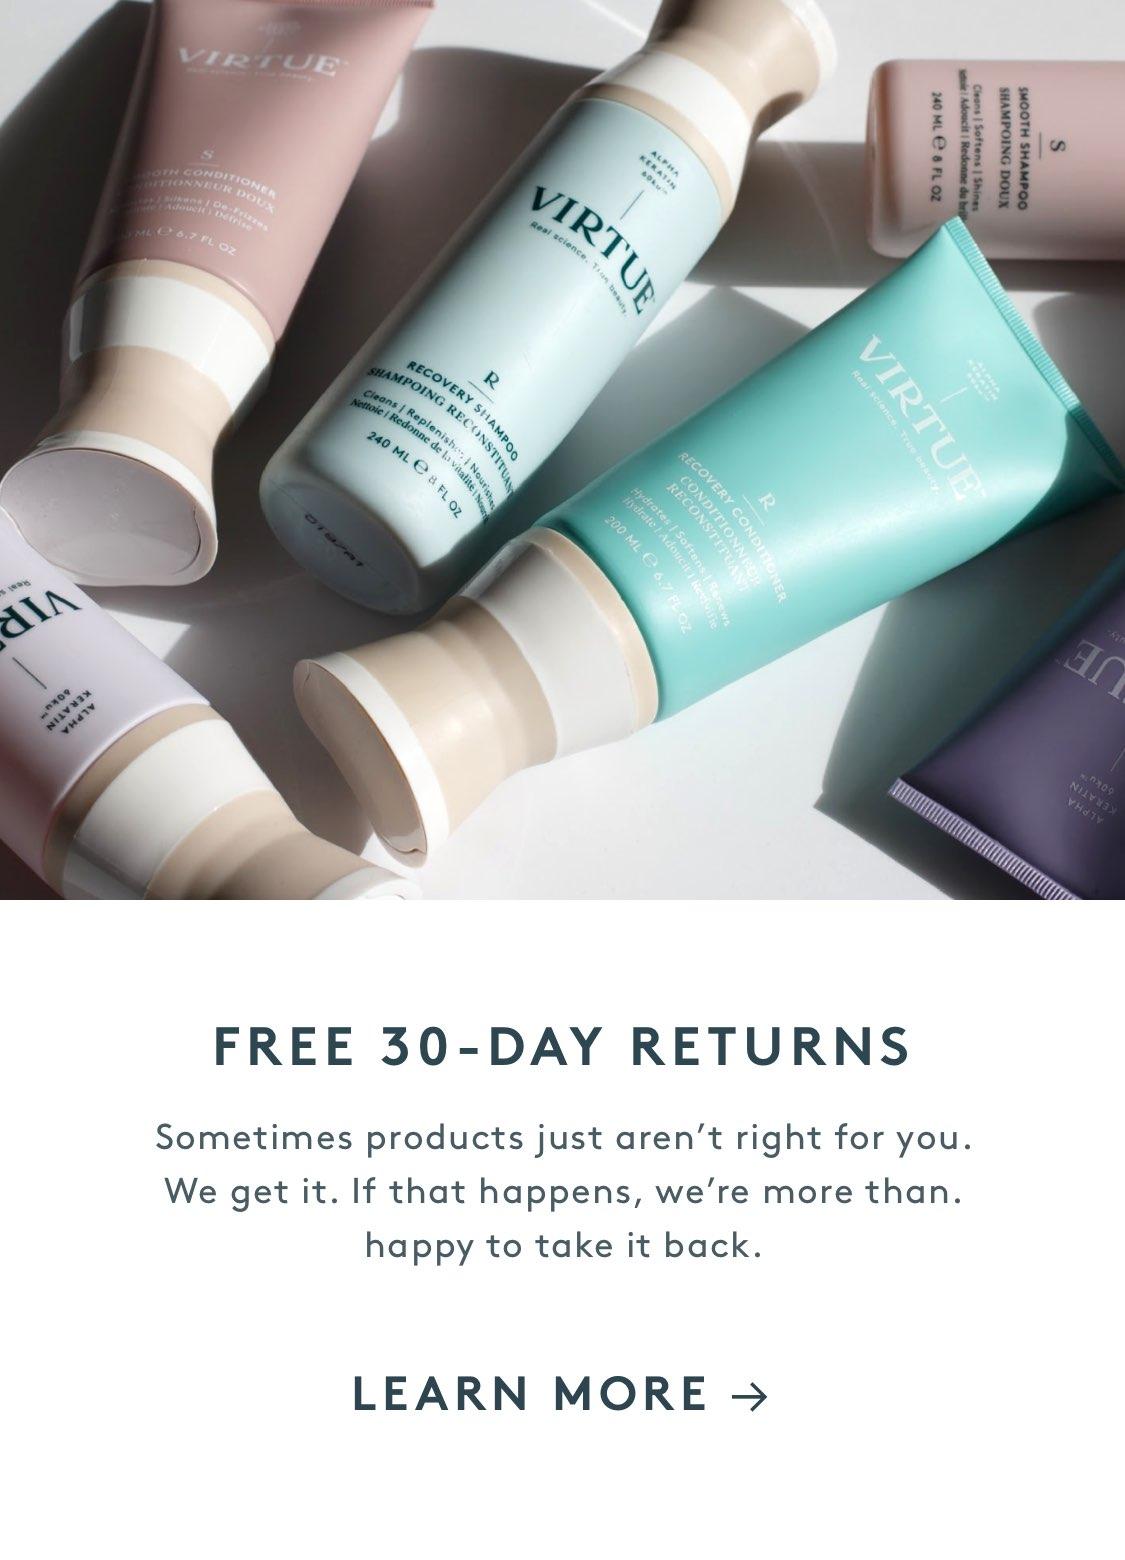 Free 30-Day Returns